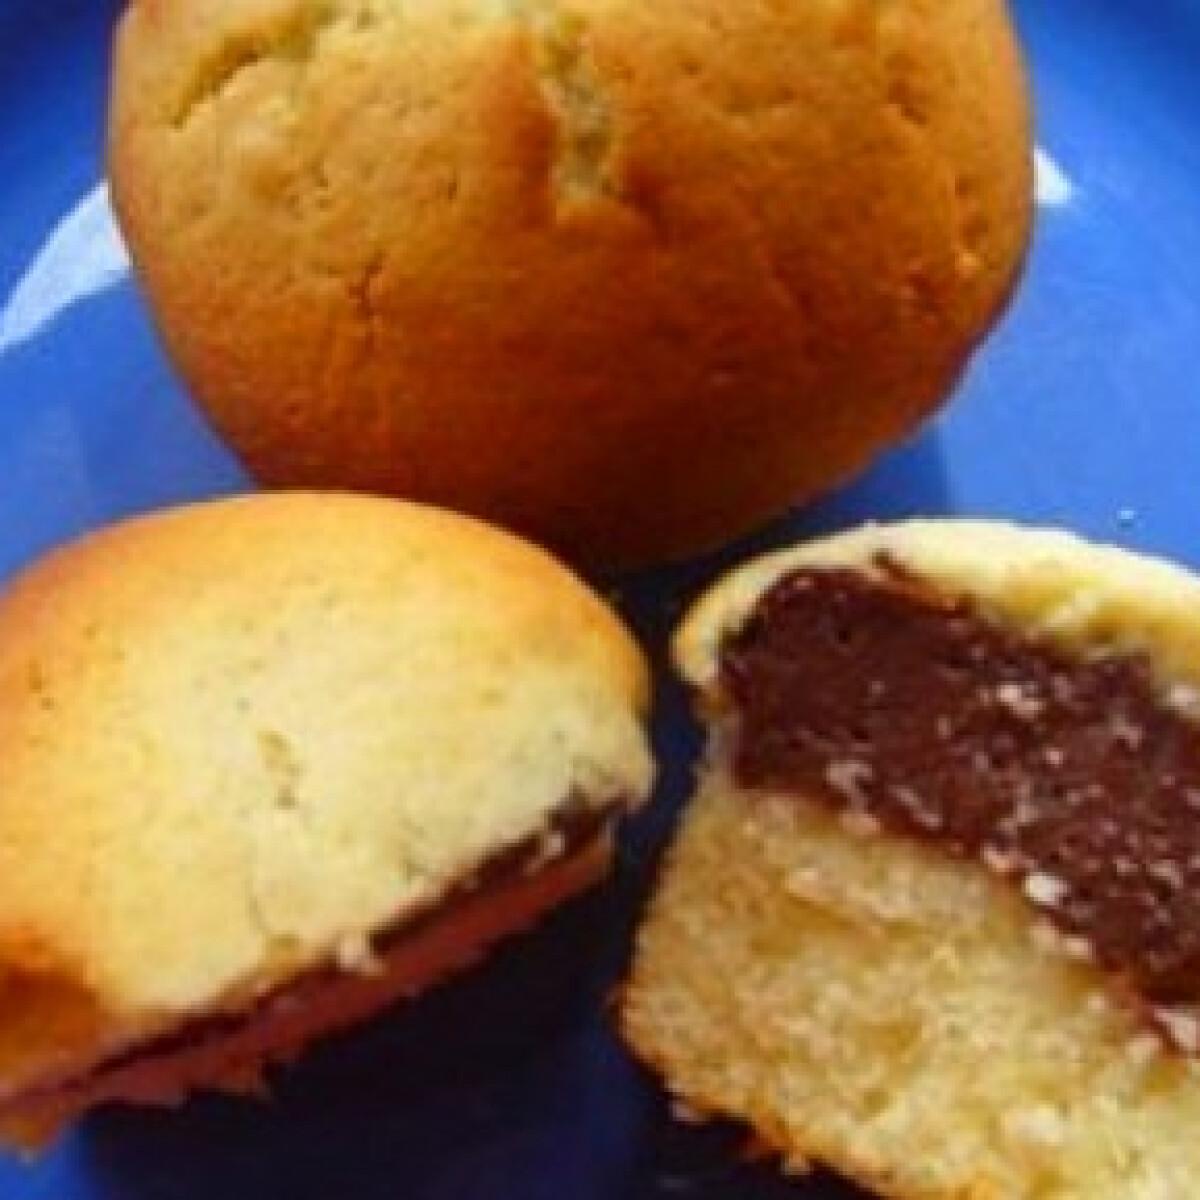 Ezen a képen: Pudinggal töltött muffin 4. - csokipudingos